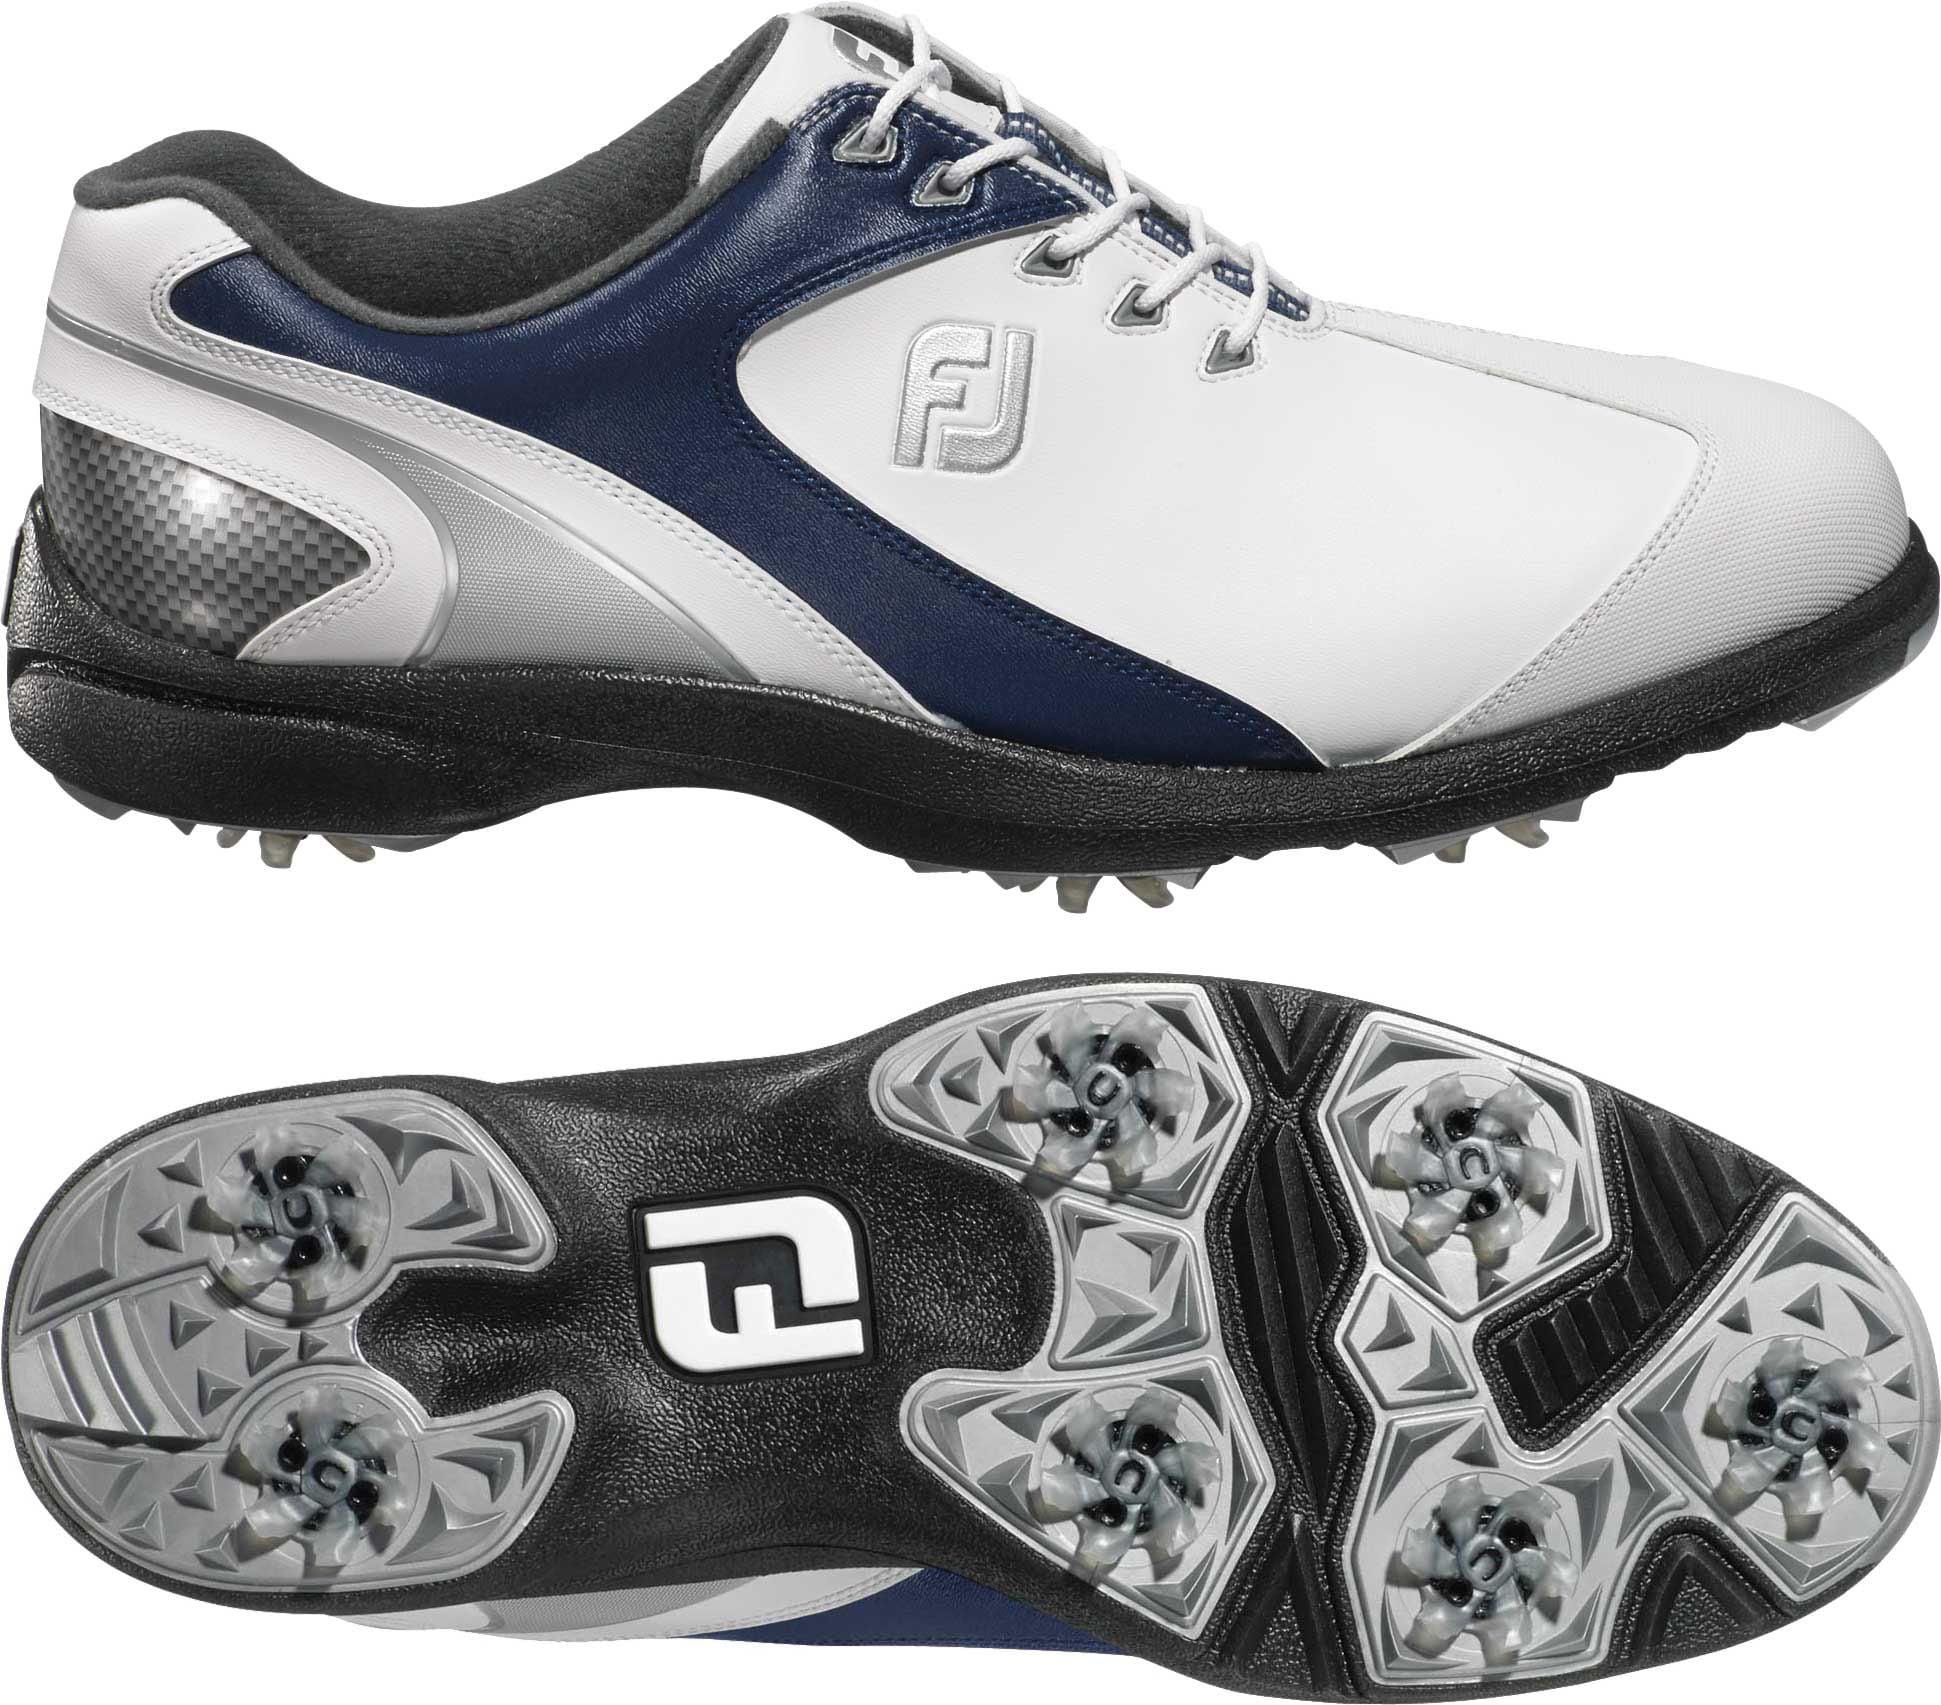 FootJoy Men's Sport LT Golf Shoes